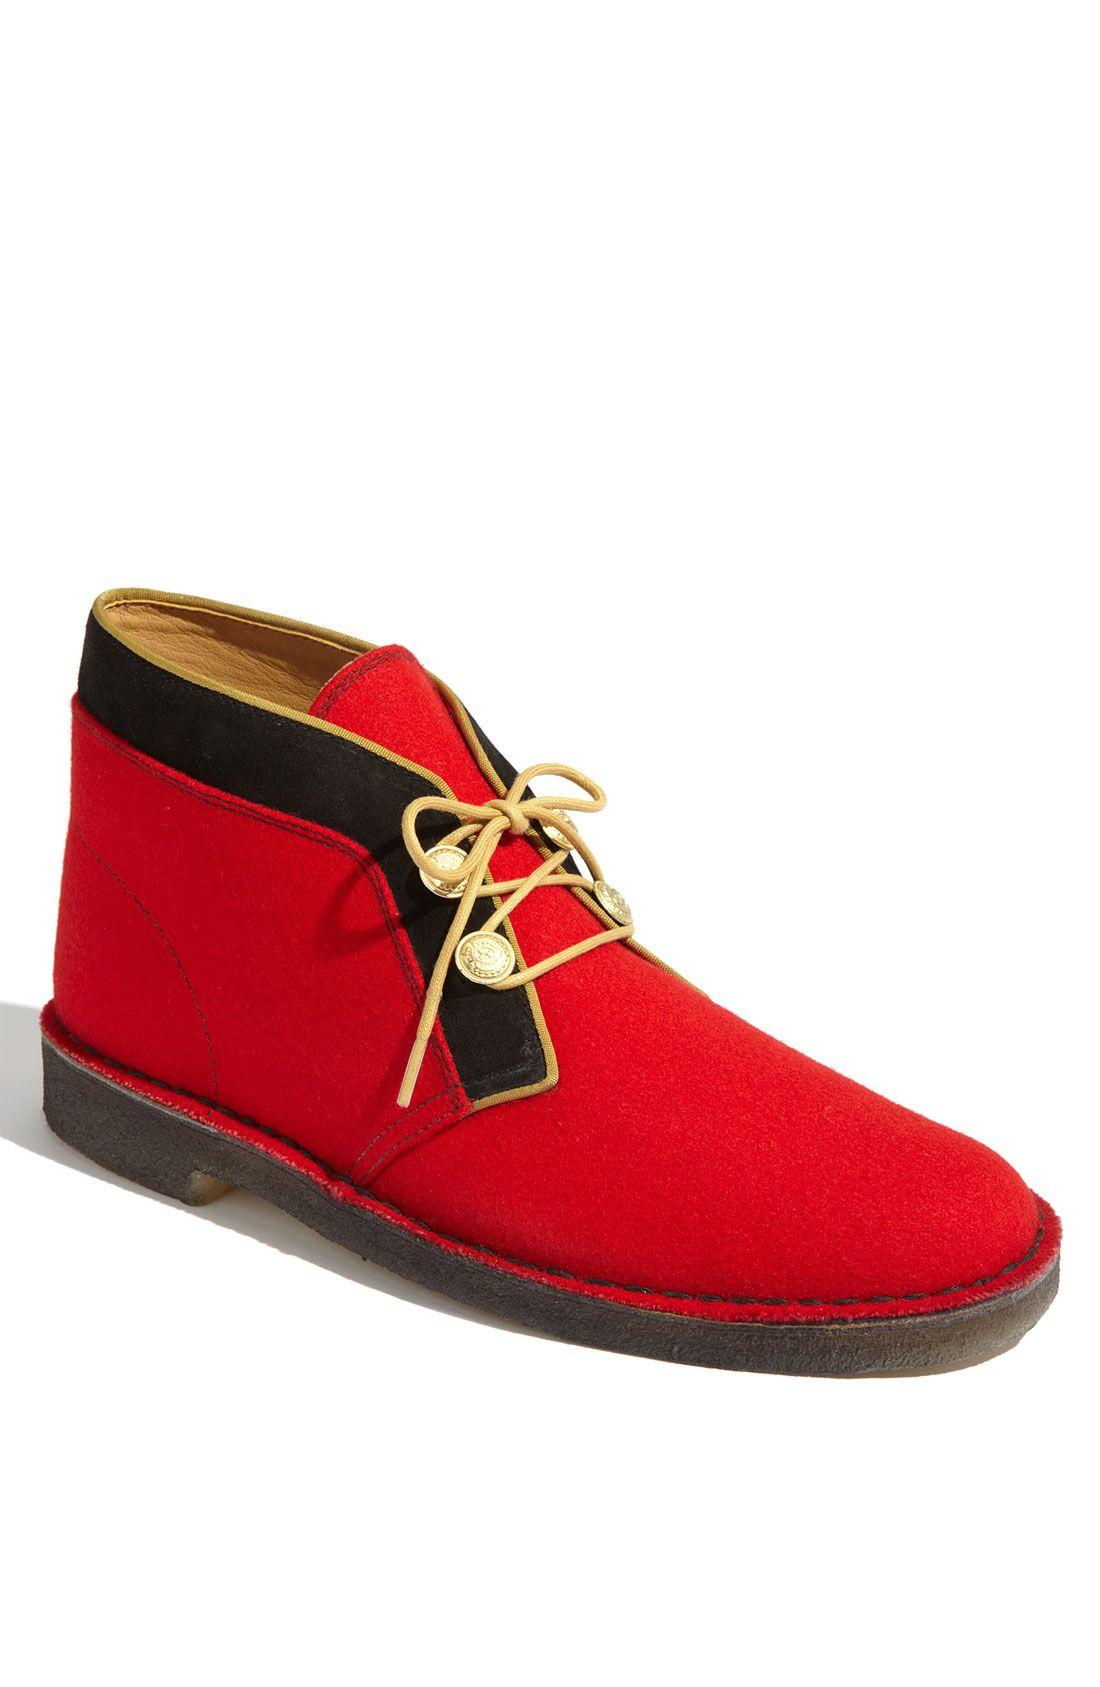 Mens desert boots, Clarks originals